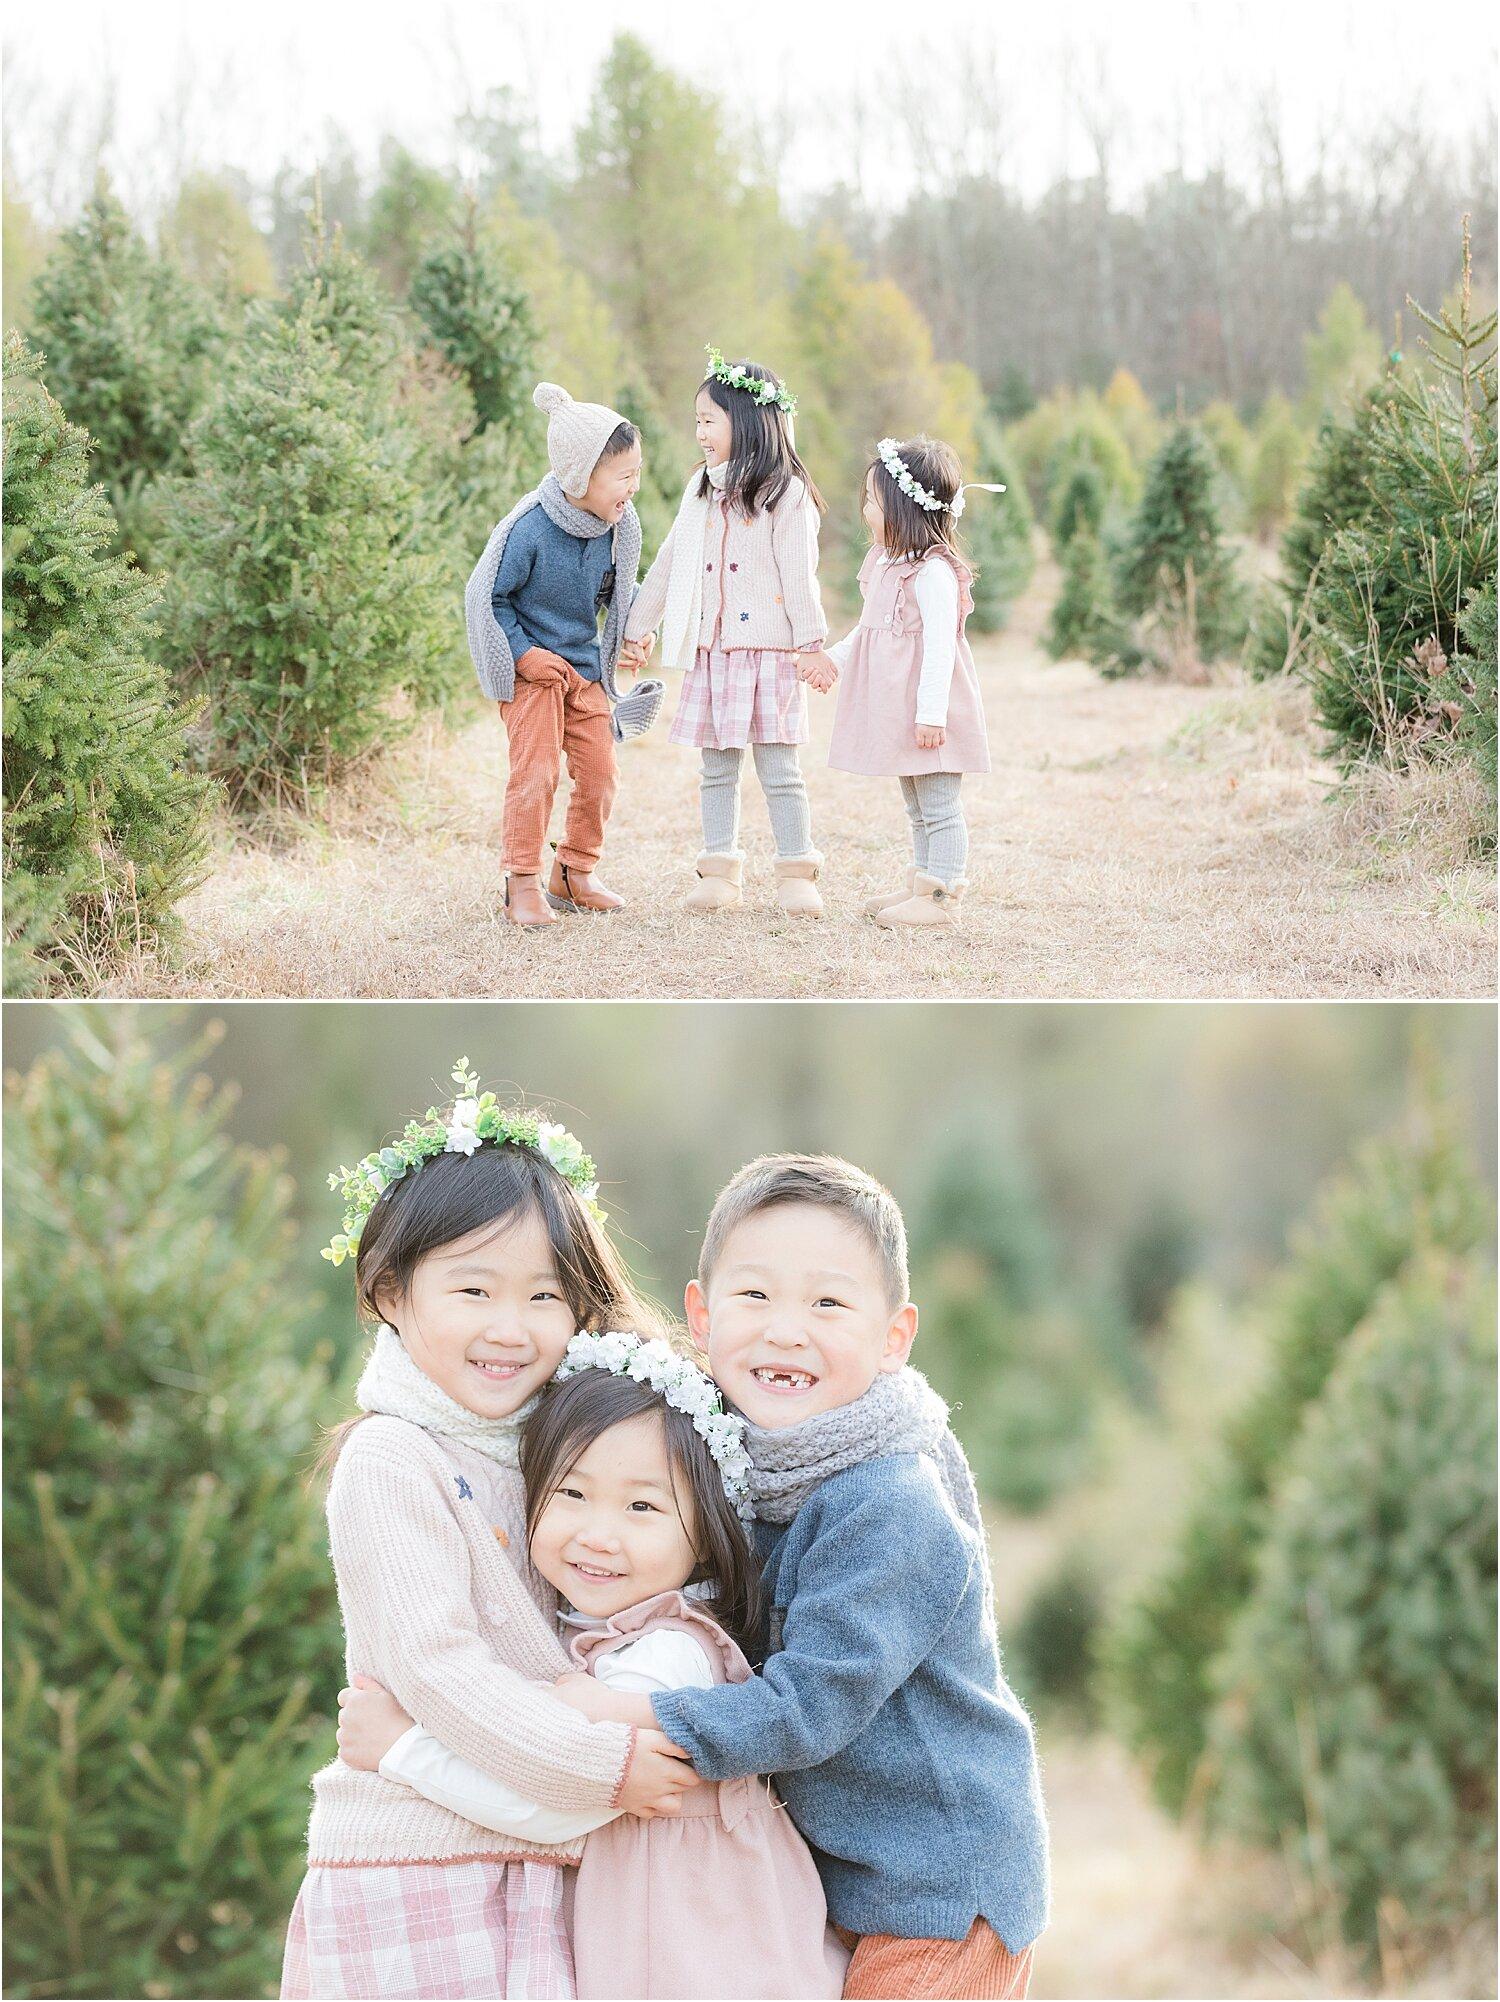 Family Holiday Photos At A Tree Farm In Nj Nj Natural Light Photographers Jac Jules